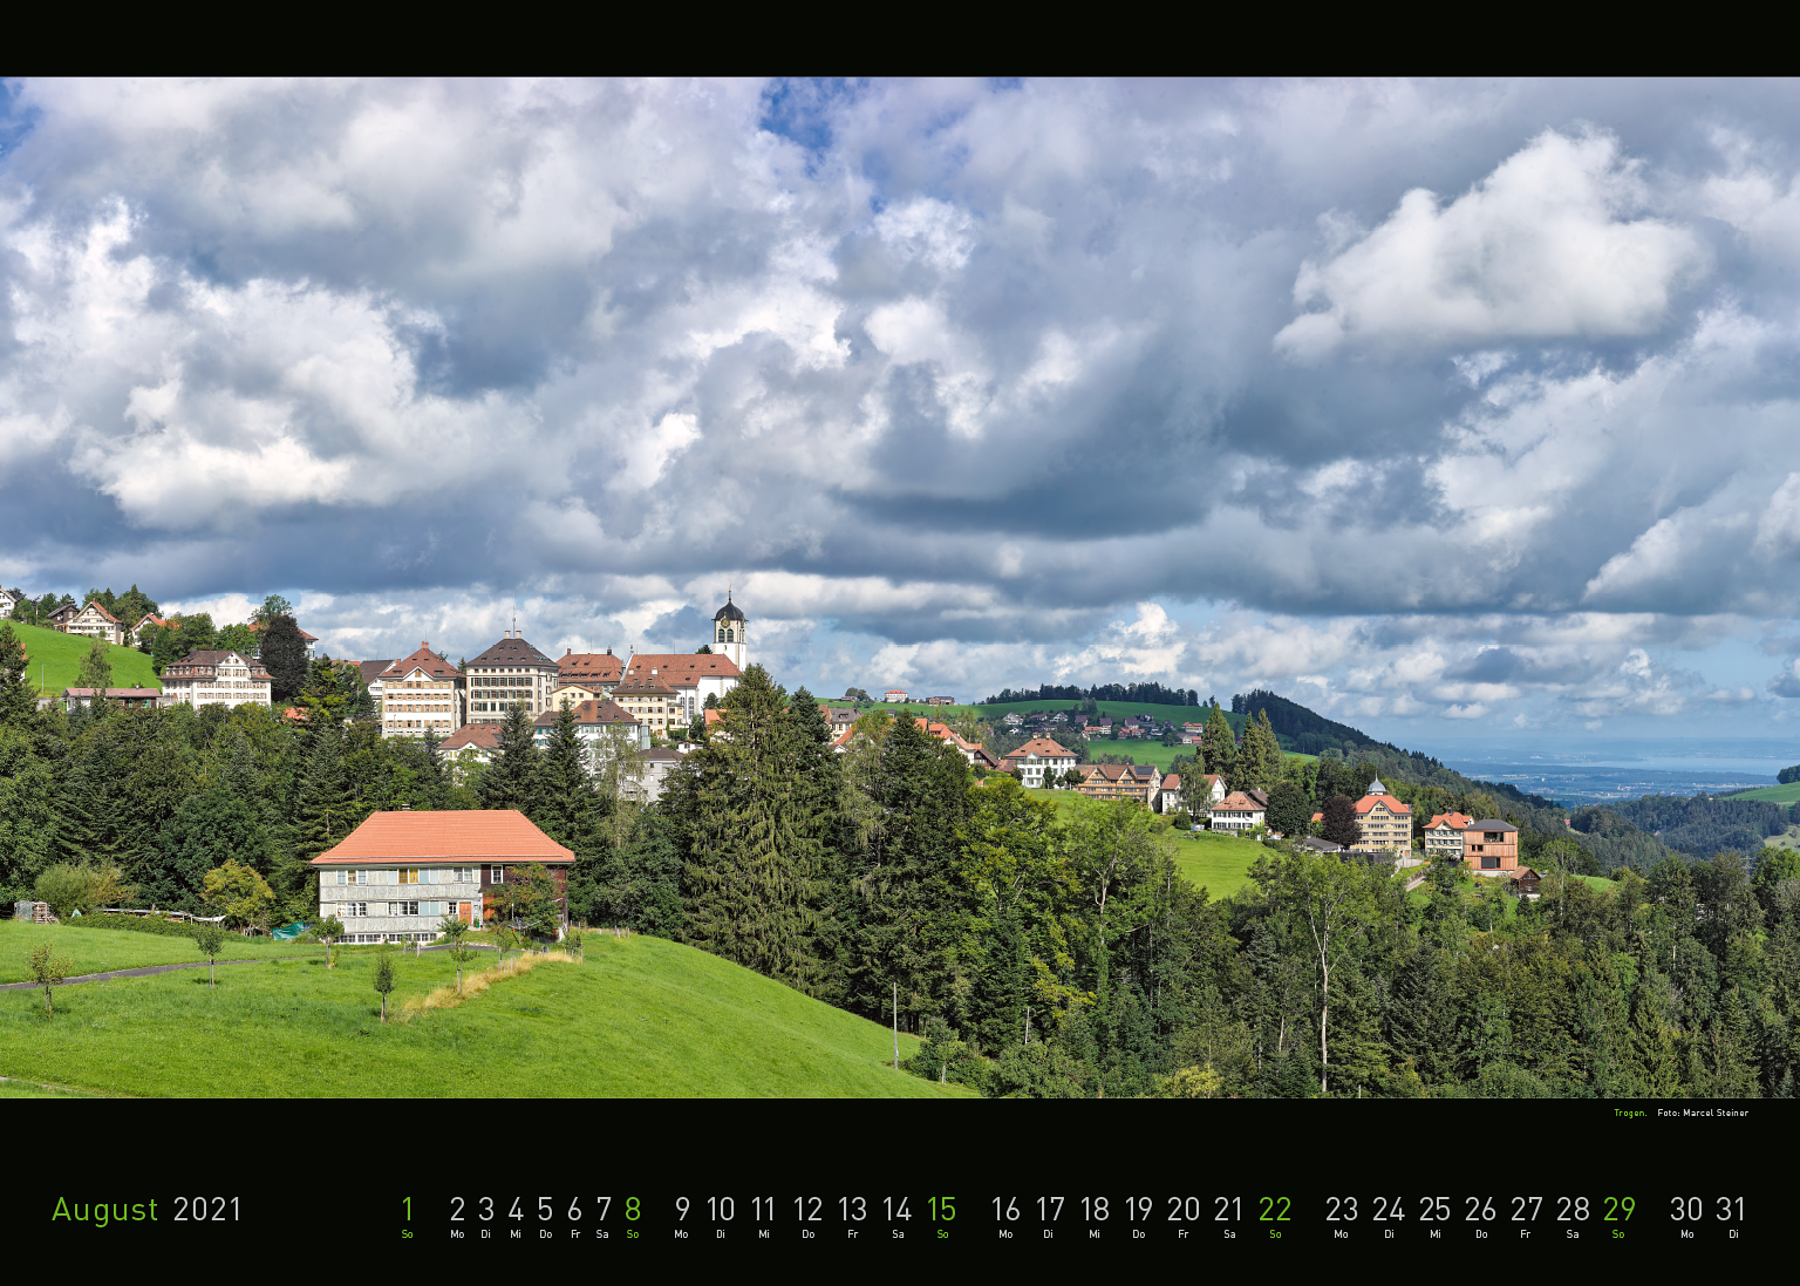 Panorama Appenzellerland 2021 August